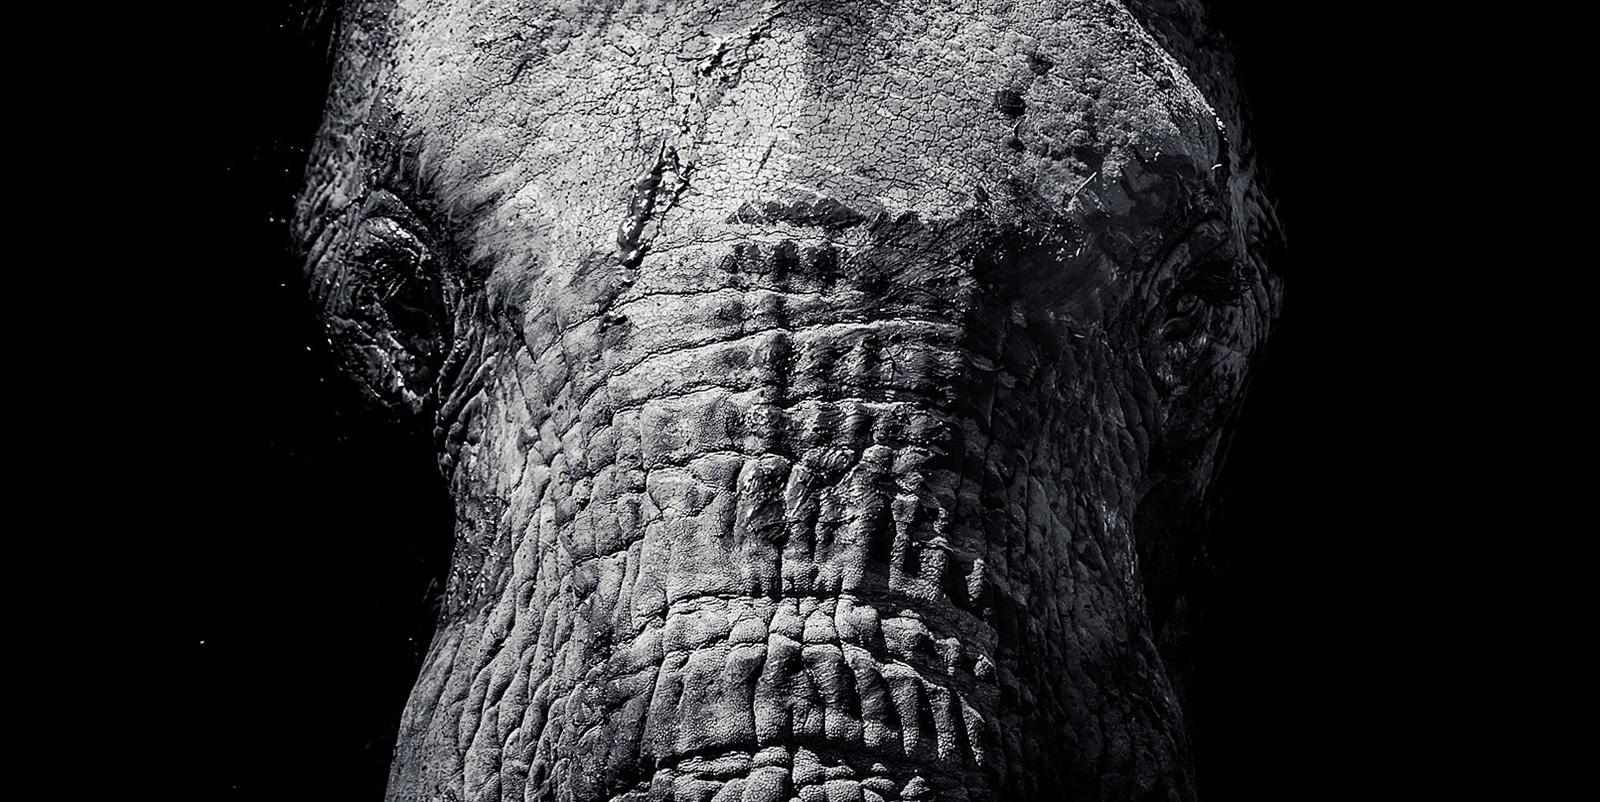 Elephant, black and white wildlife photo by Richard Costin